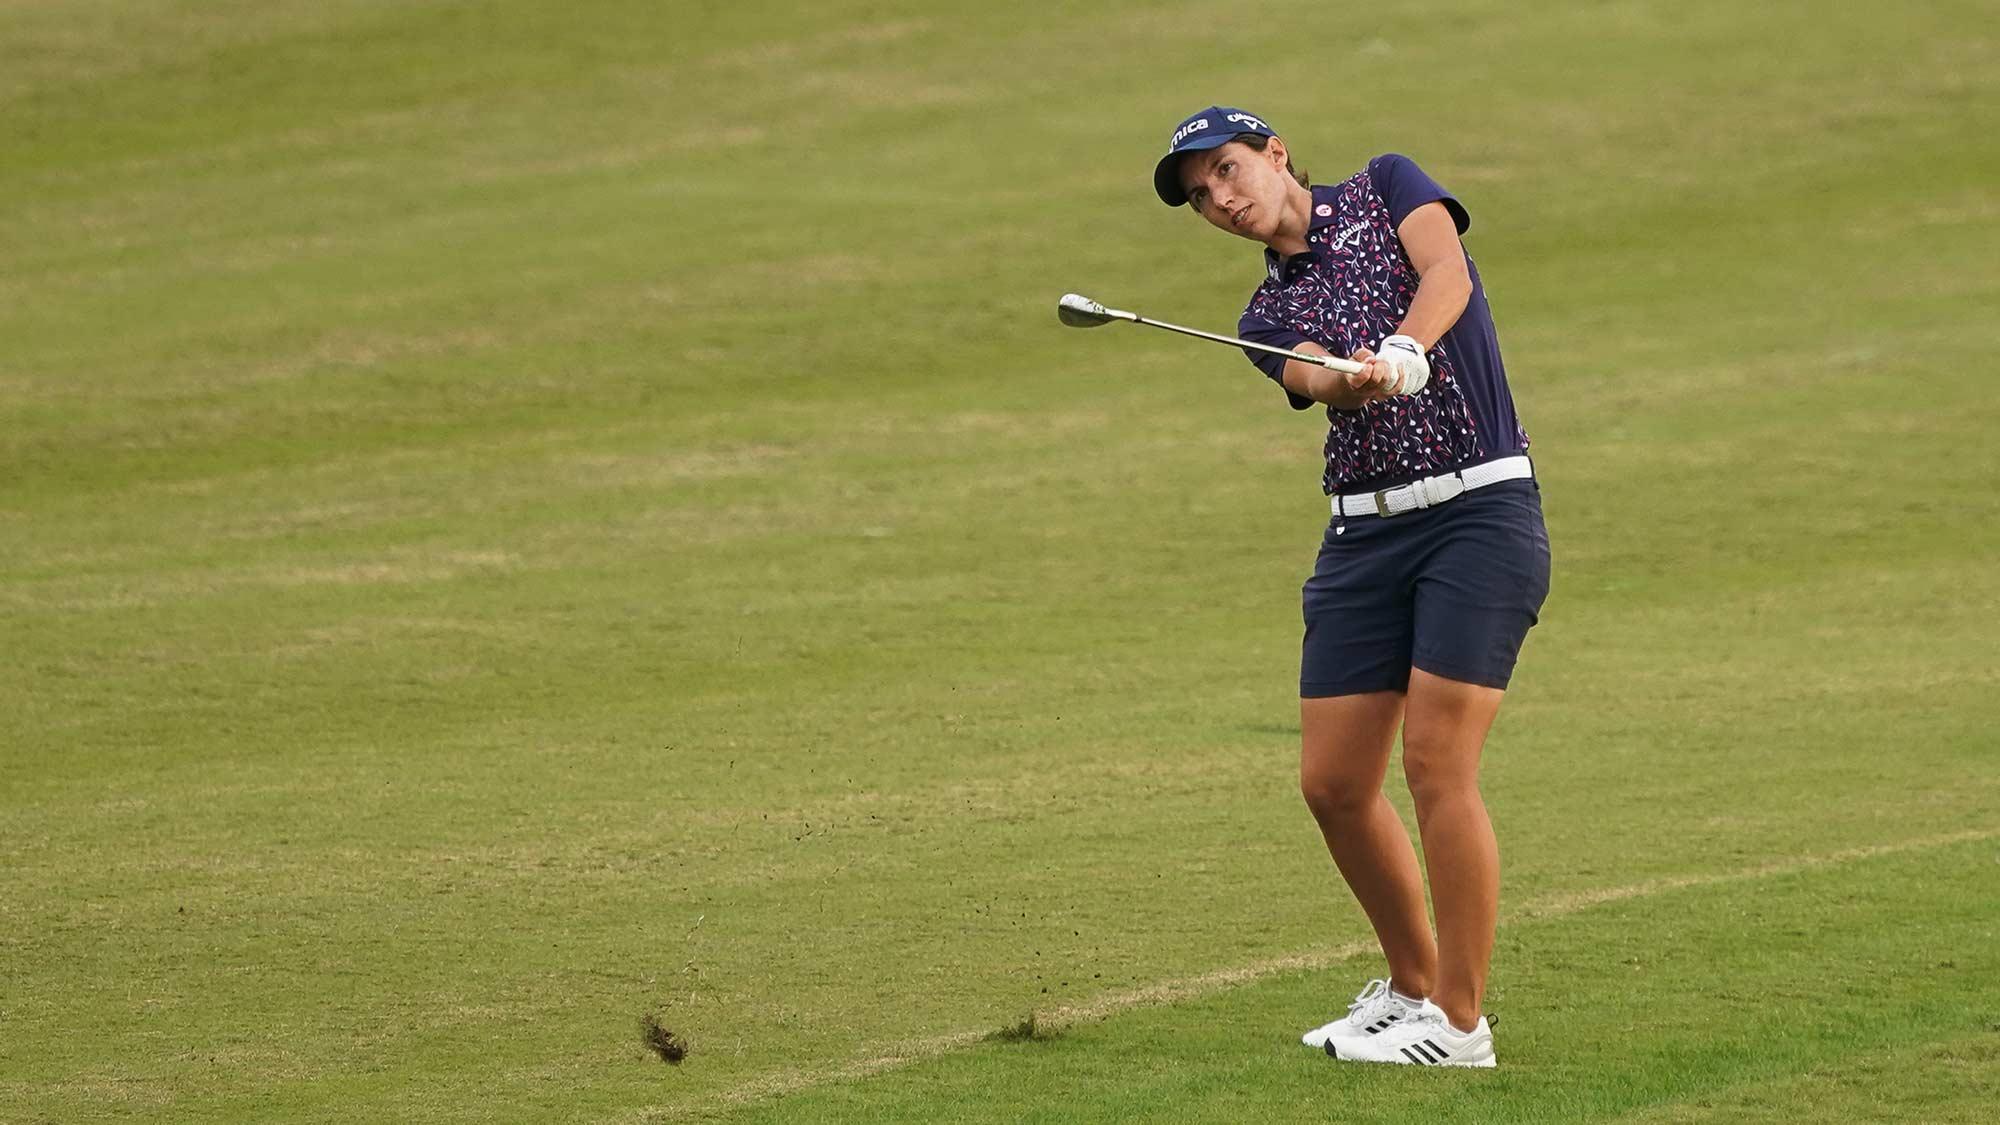 2019 Rolex Moves of the Week October 21 | LPGA | Ladies Professional Golf Association